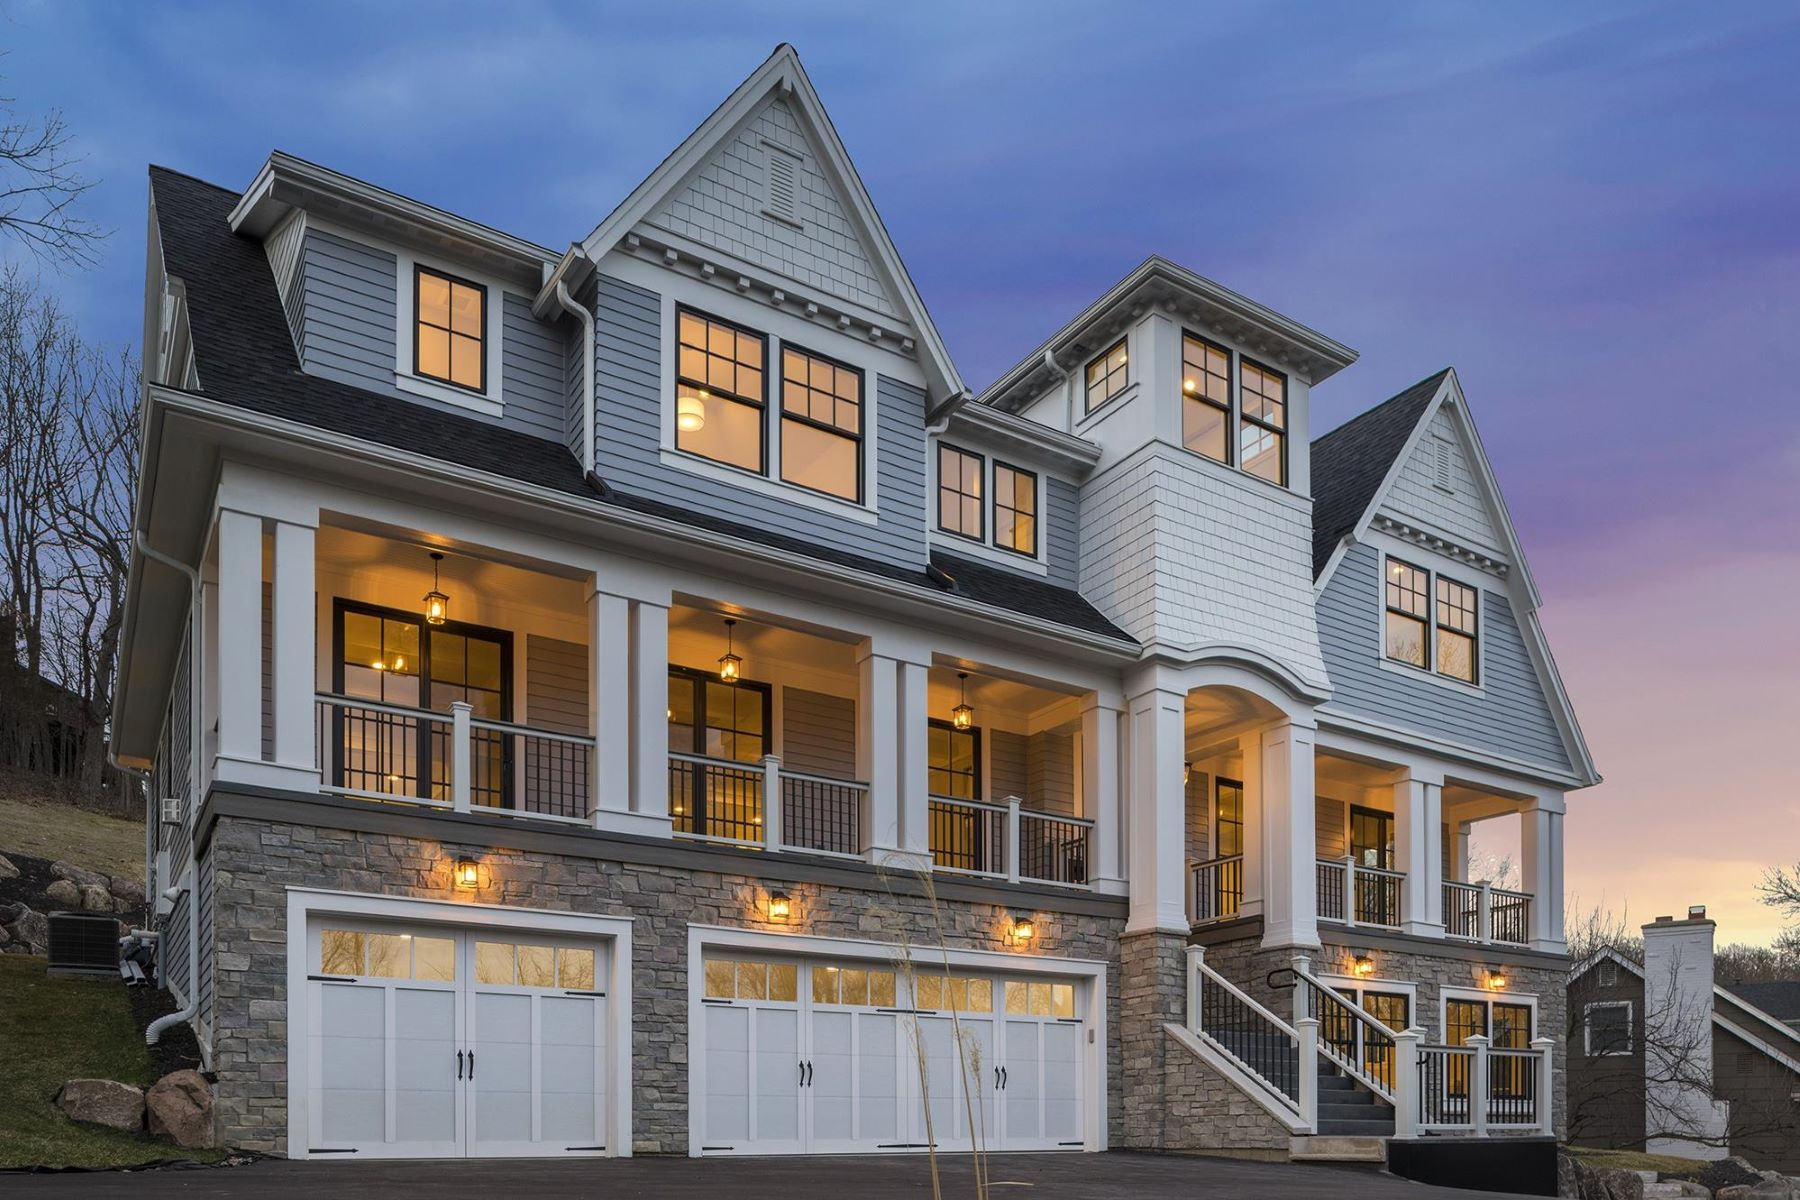 Single Family Home for Sale at 7120 Mark Terrace Drive Edina, Minnesota, 55439 United States